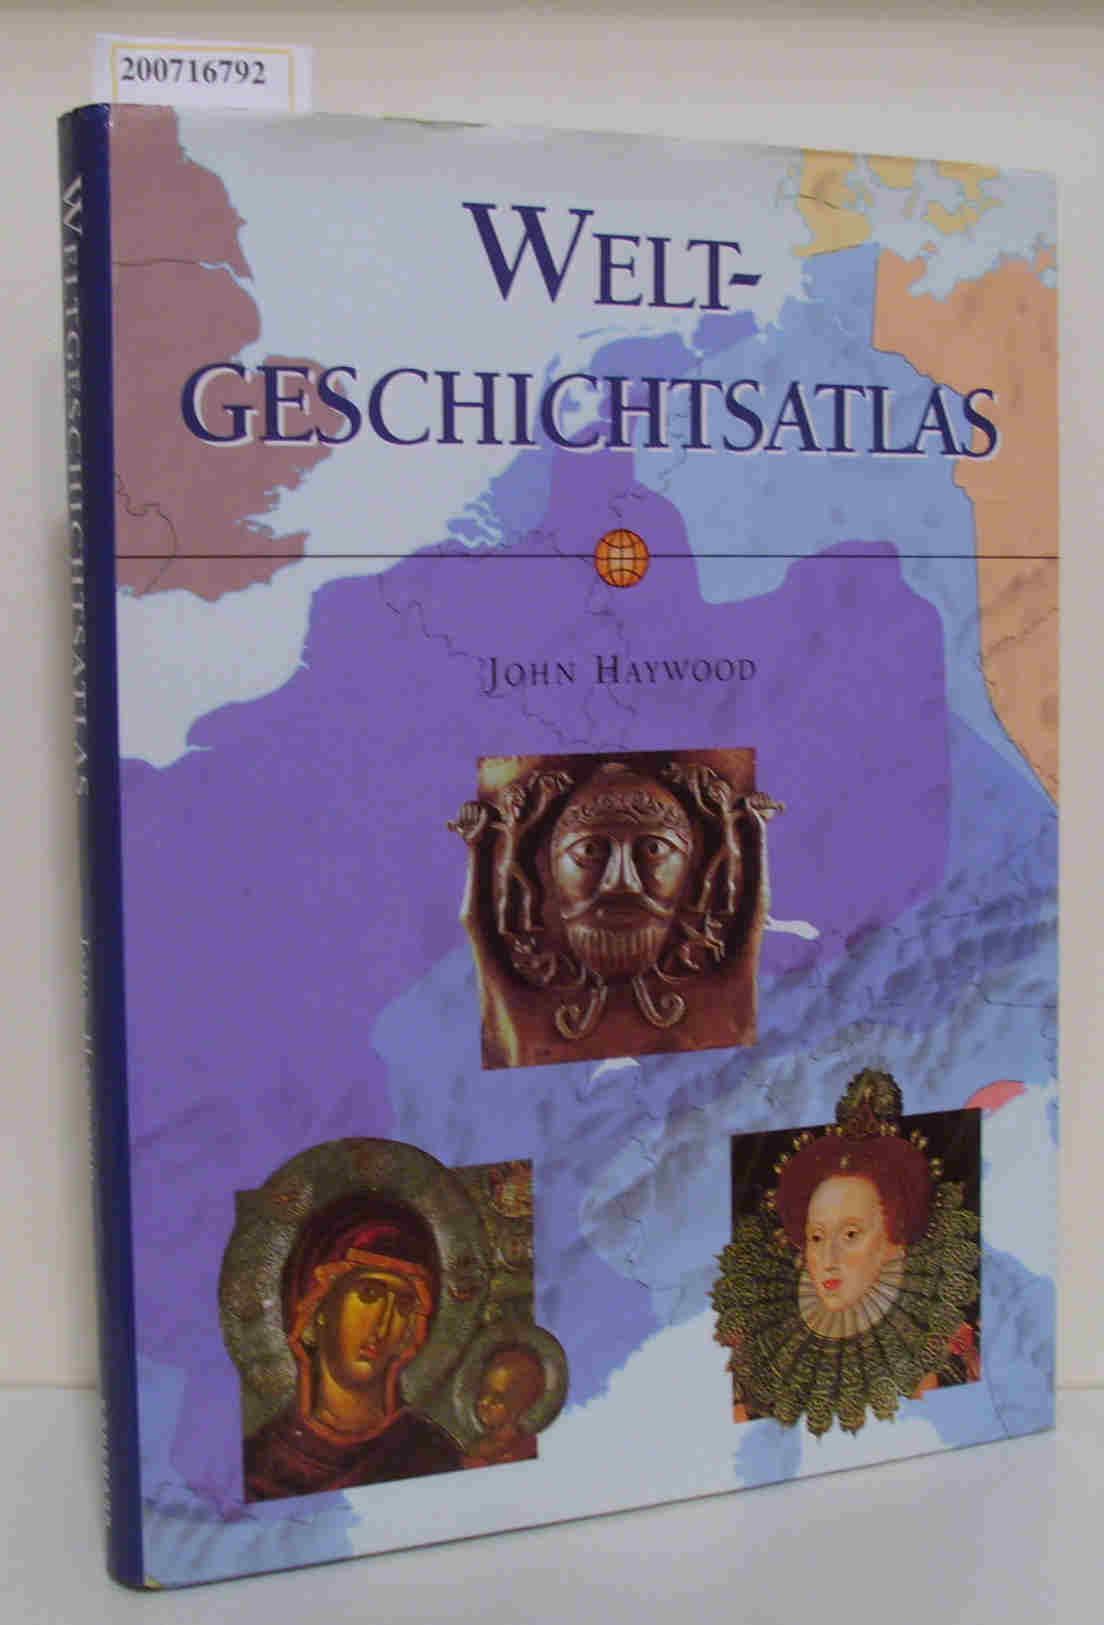 Weltgeschichtsatlas John Haywood. [Übers., Red.: Schroeder & Partner, München. Übers. aus dem Engl.: Eva Boltenhagen ...]